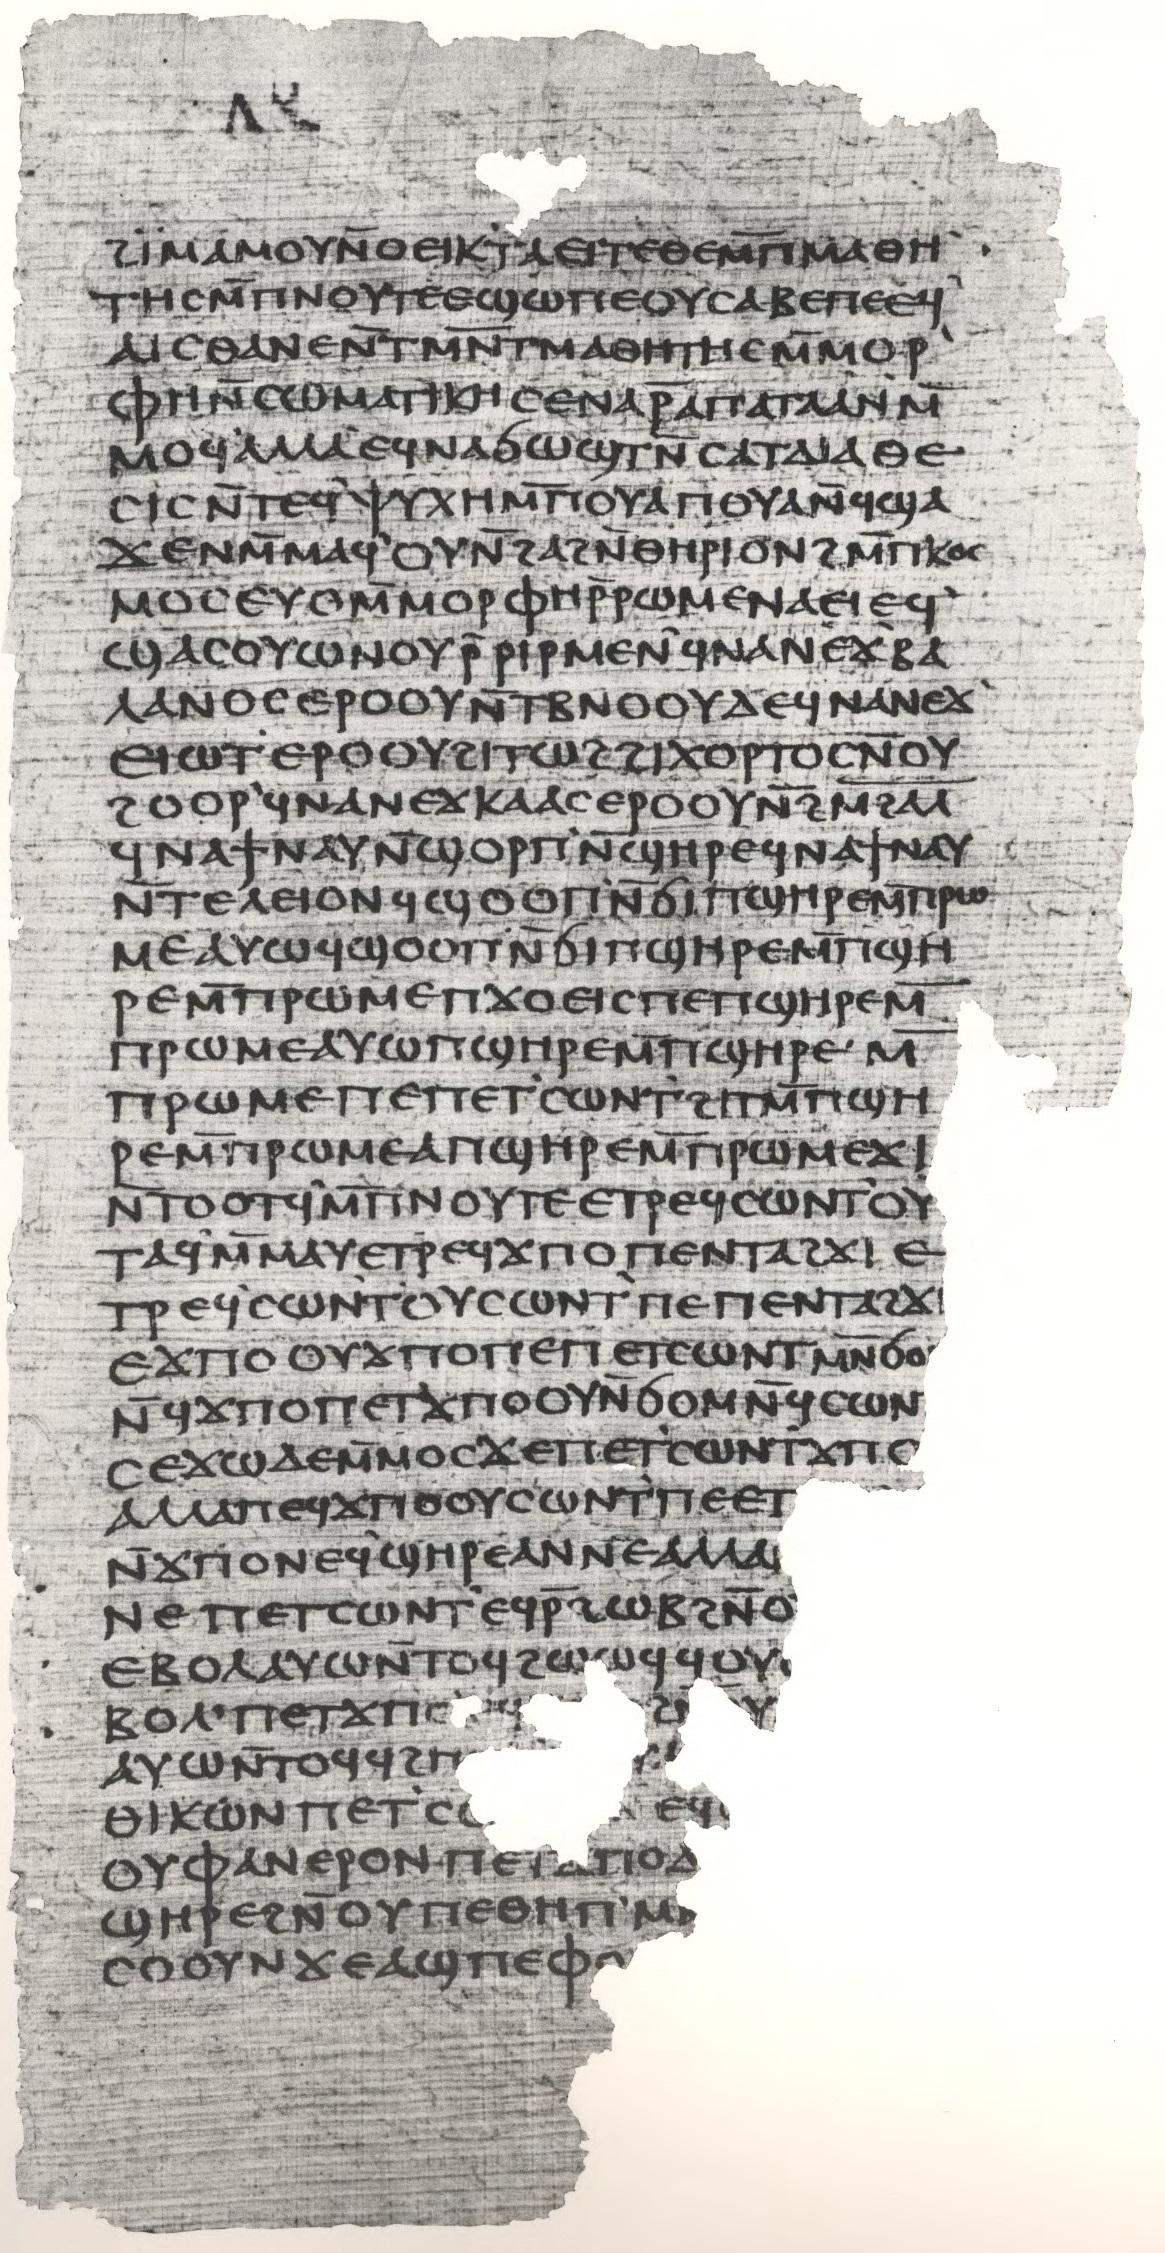 Gospel_of_Philip facsimile_Page_81.jpg